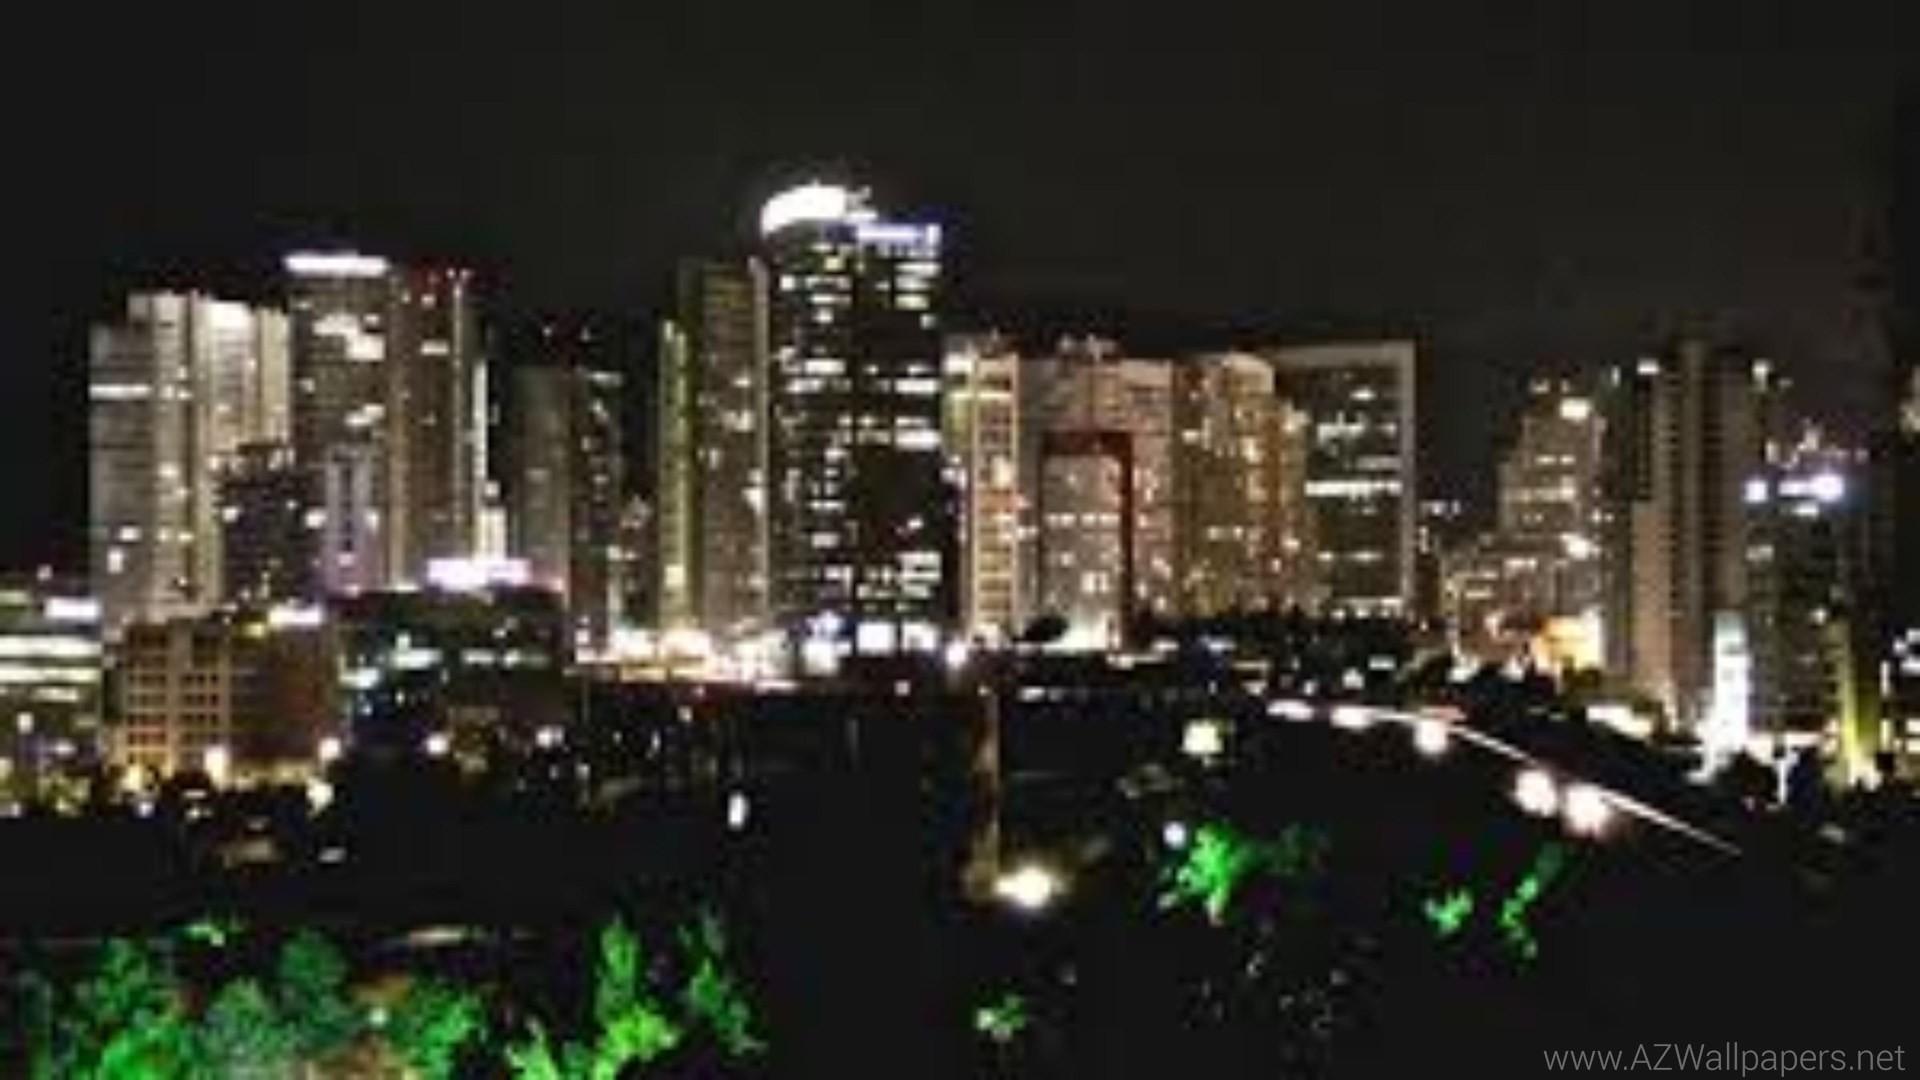 City Night Wallpaper HD – WallpaperSafari